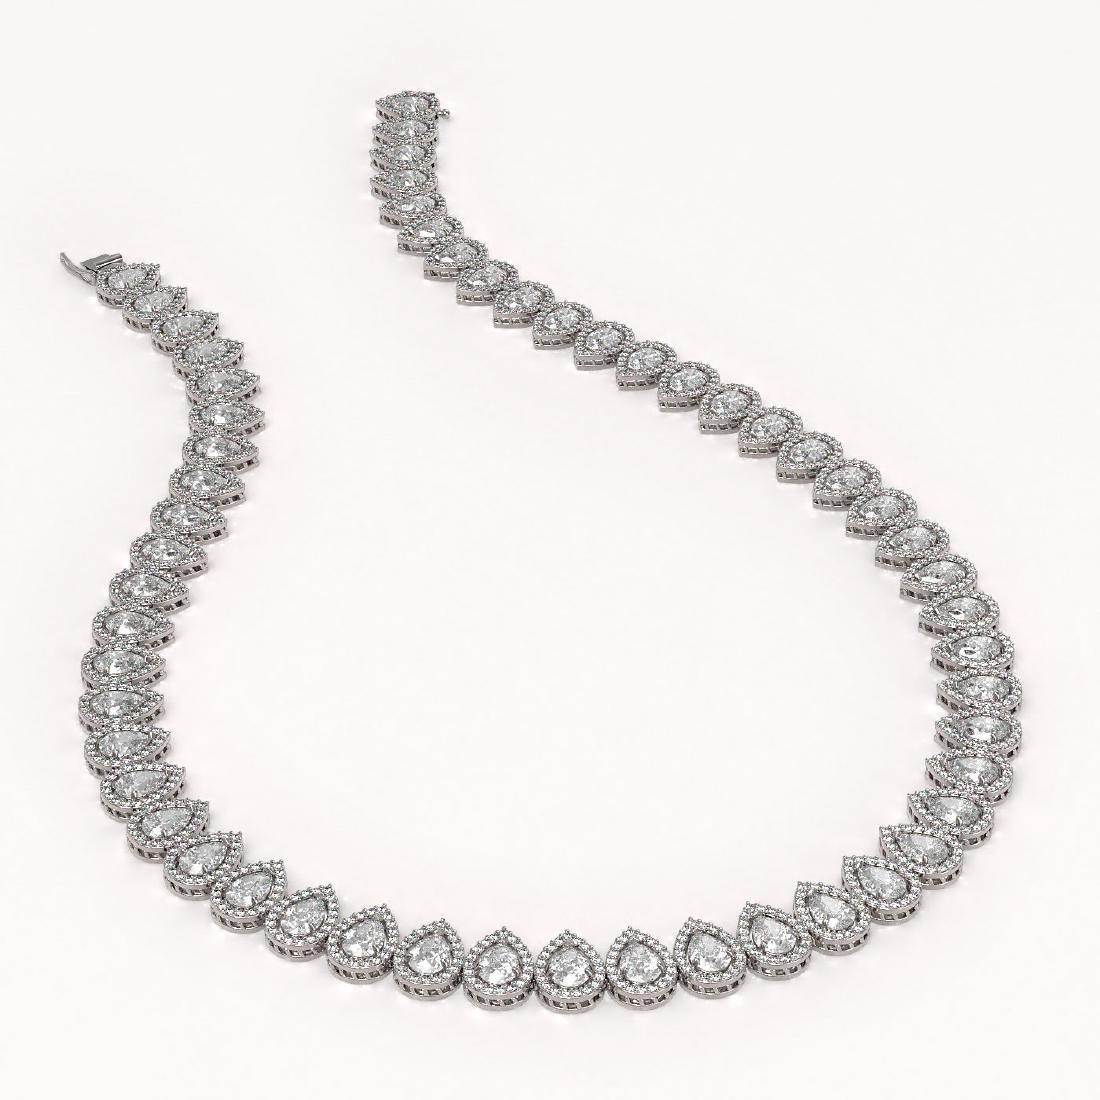 42.11 CTW Pear Diamond Designer Necklace 18K White Gold - 2